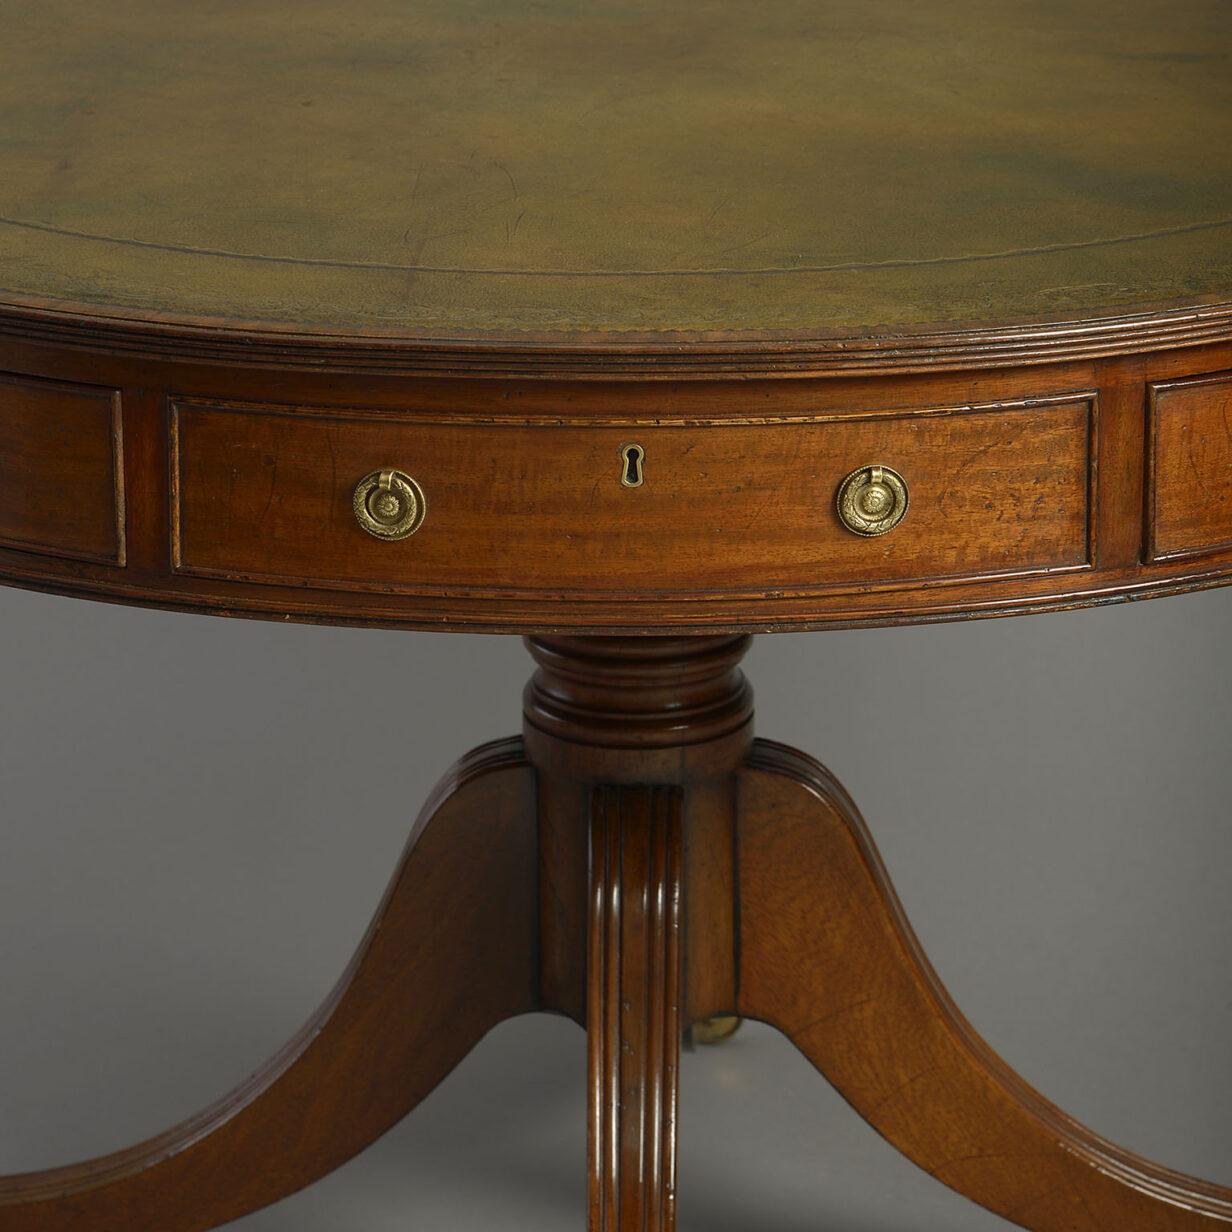 George III Style Drum Table